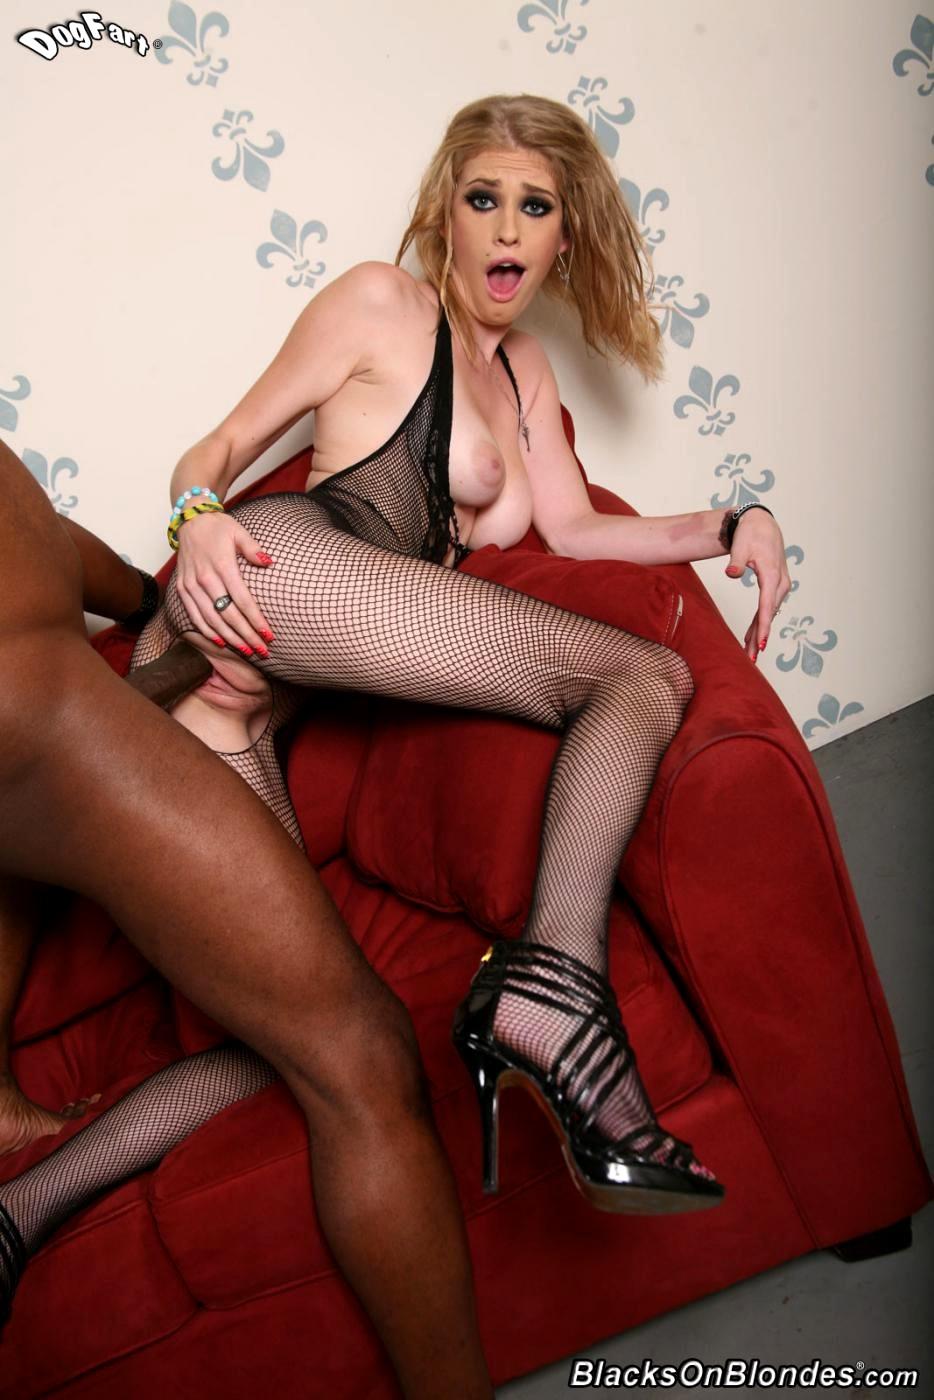 Allie James Sex blacksonblondes allie james xxximej anal sex modelsvideo